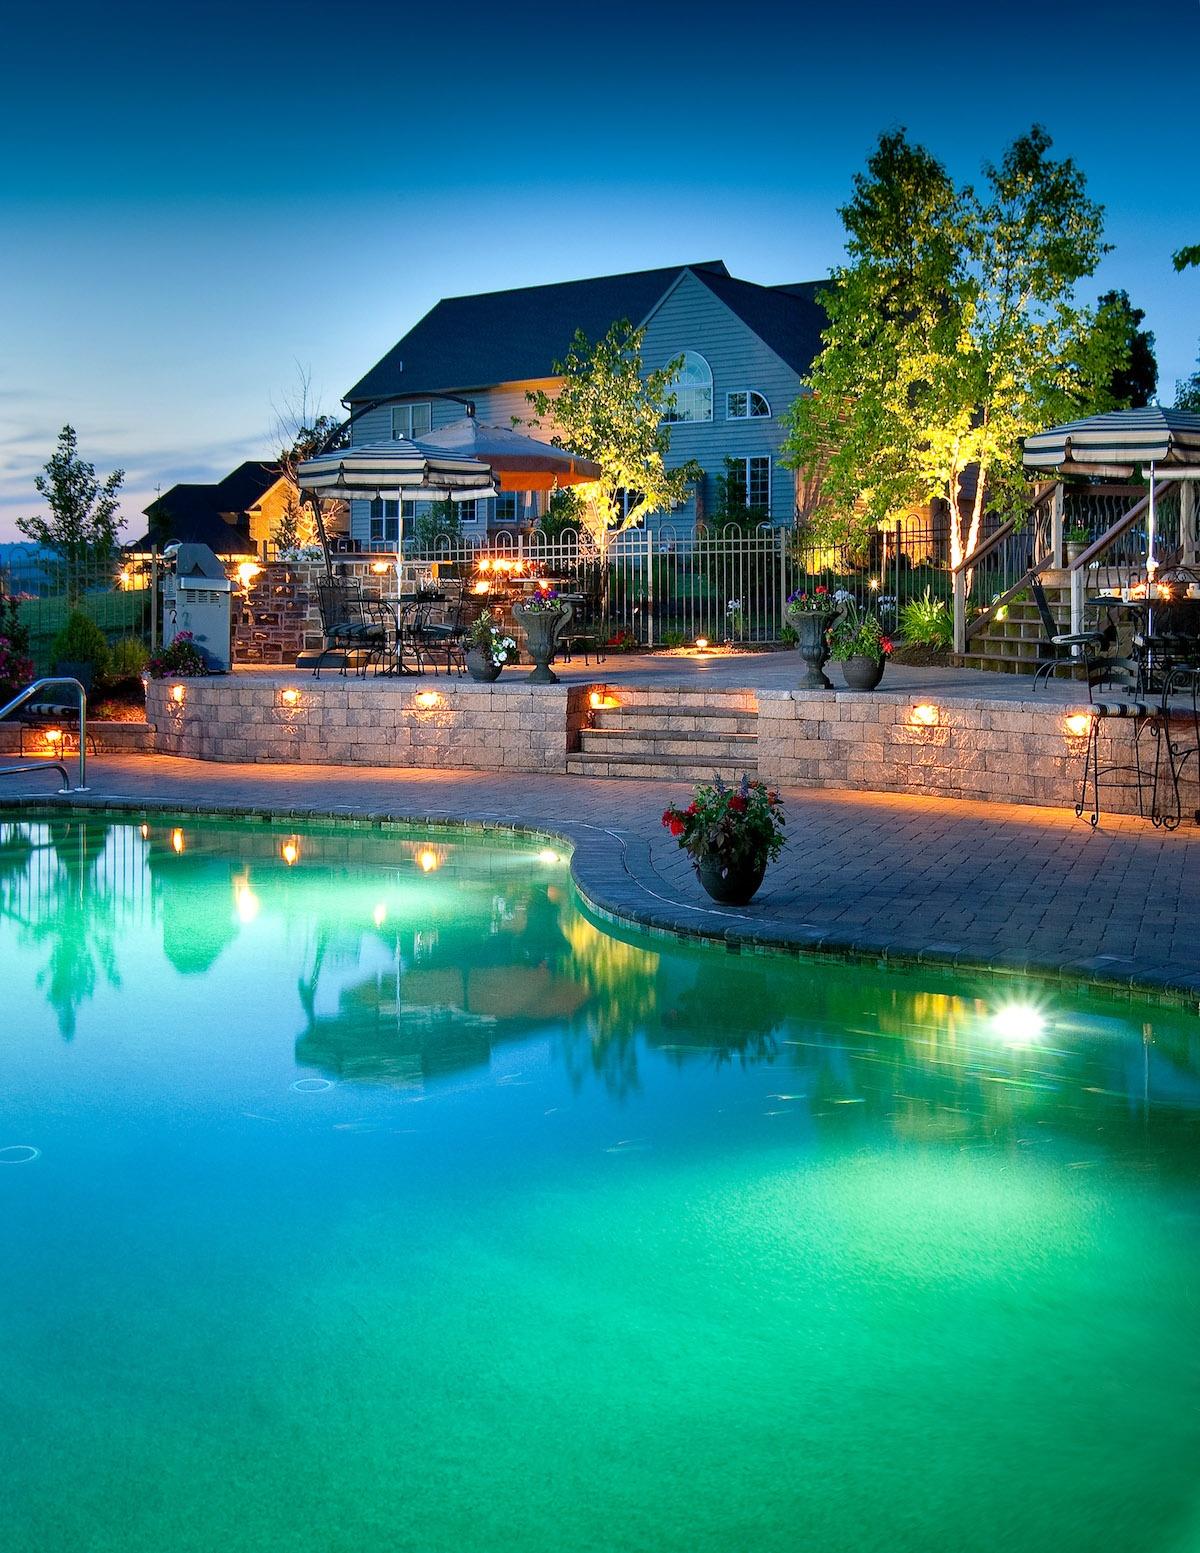 Hollander-spa-pool-patio-wall-steps-lighting-2